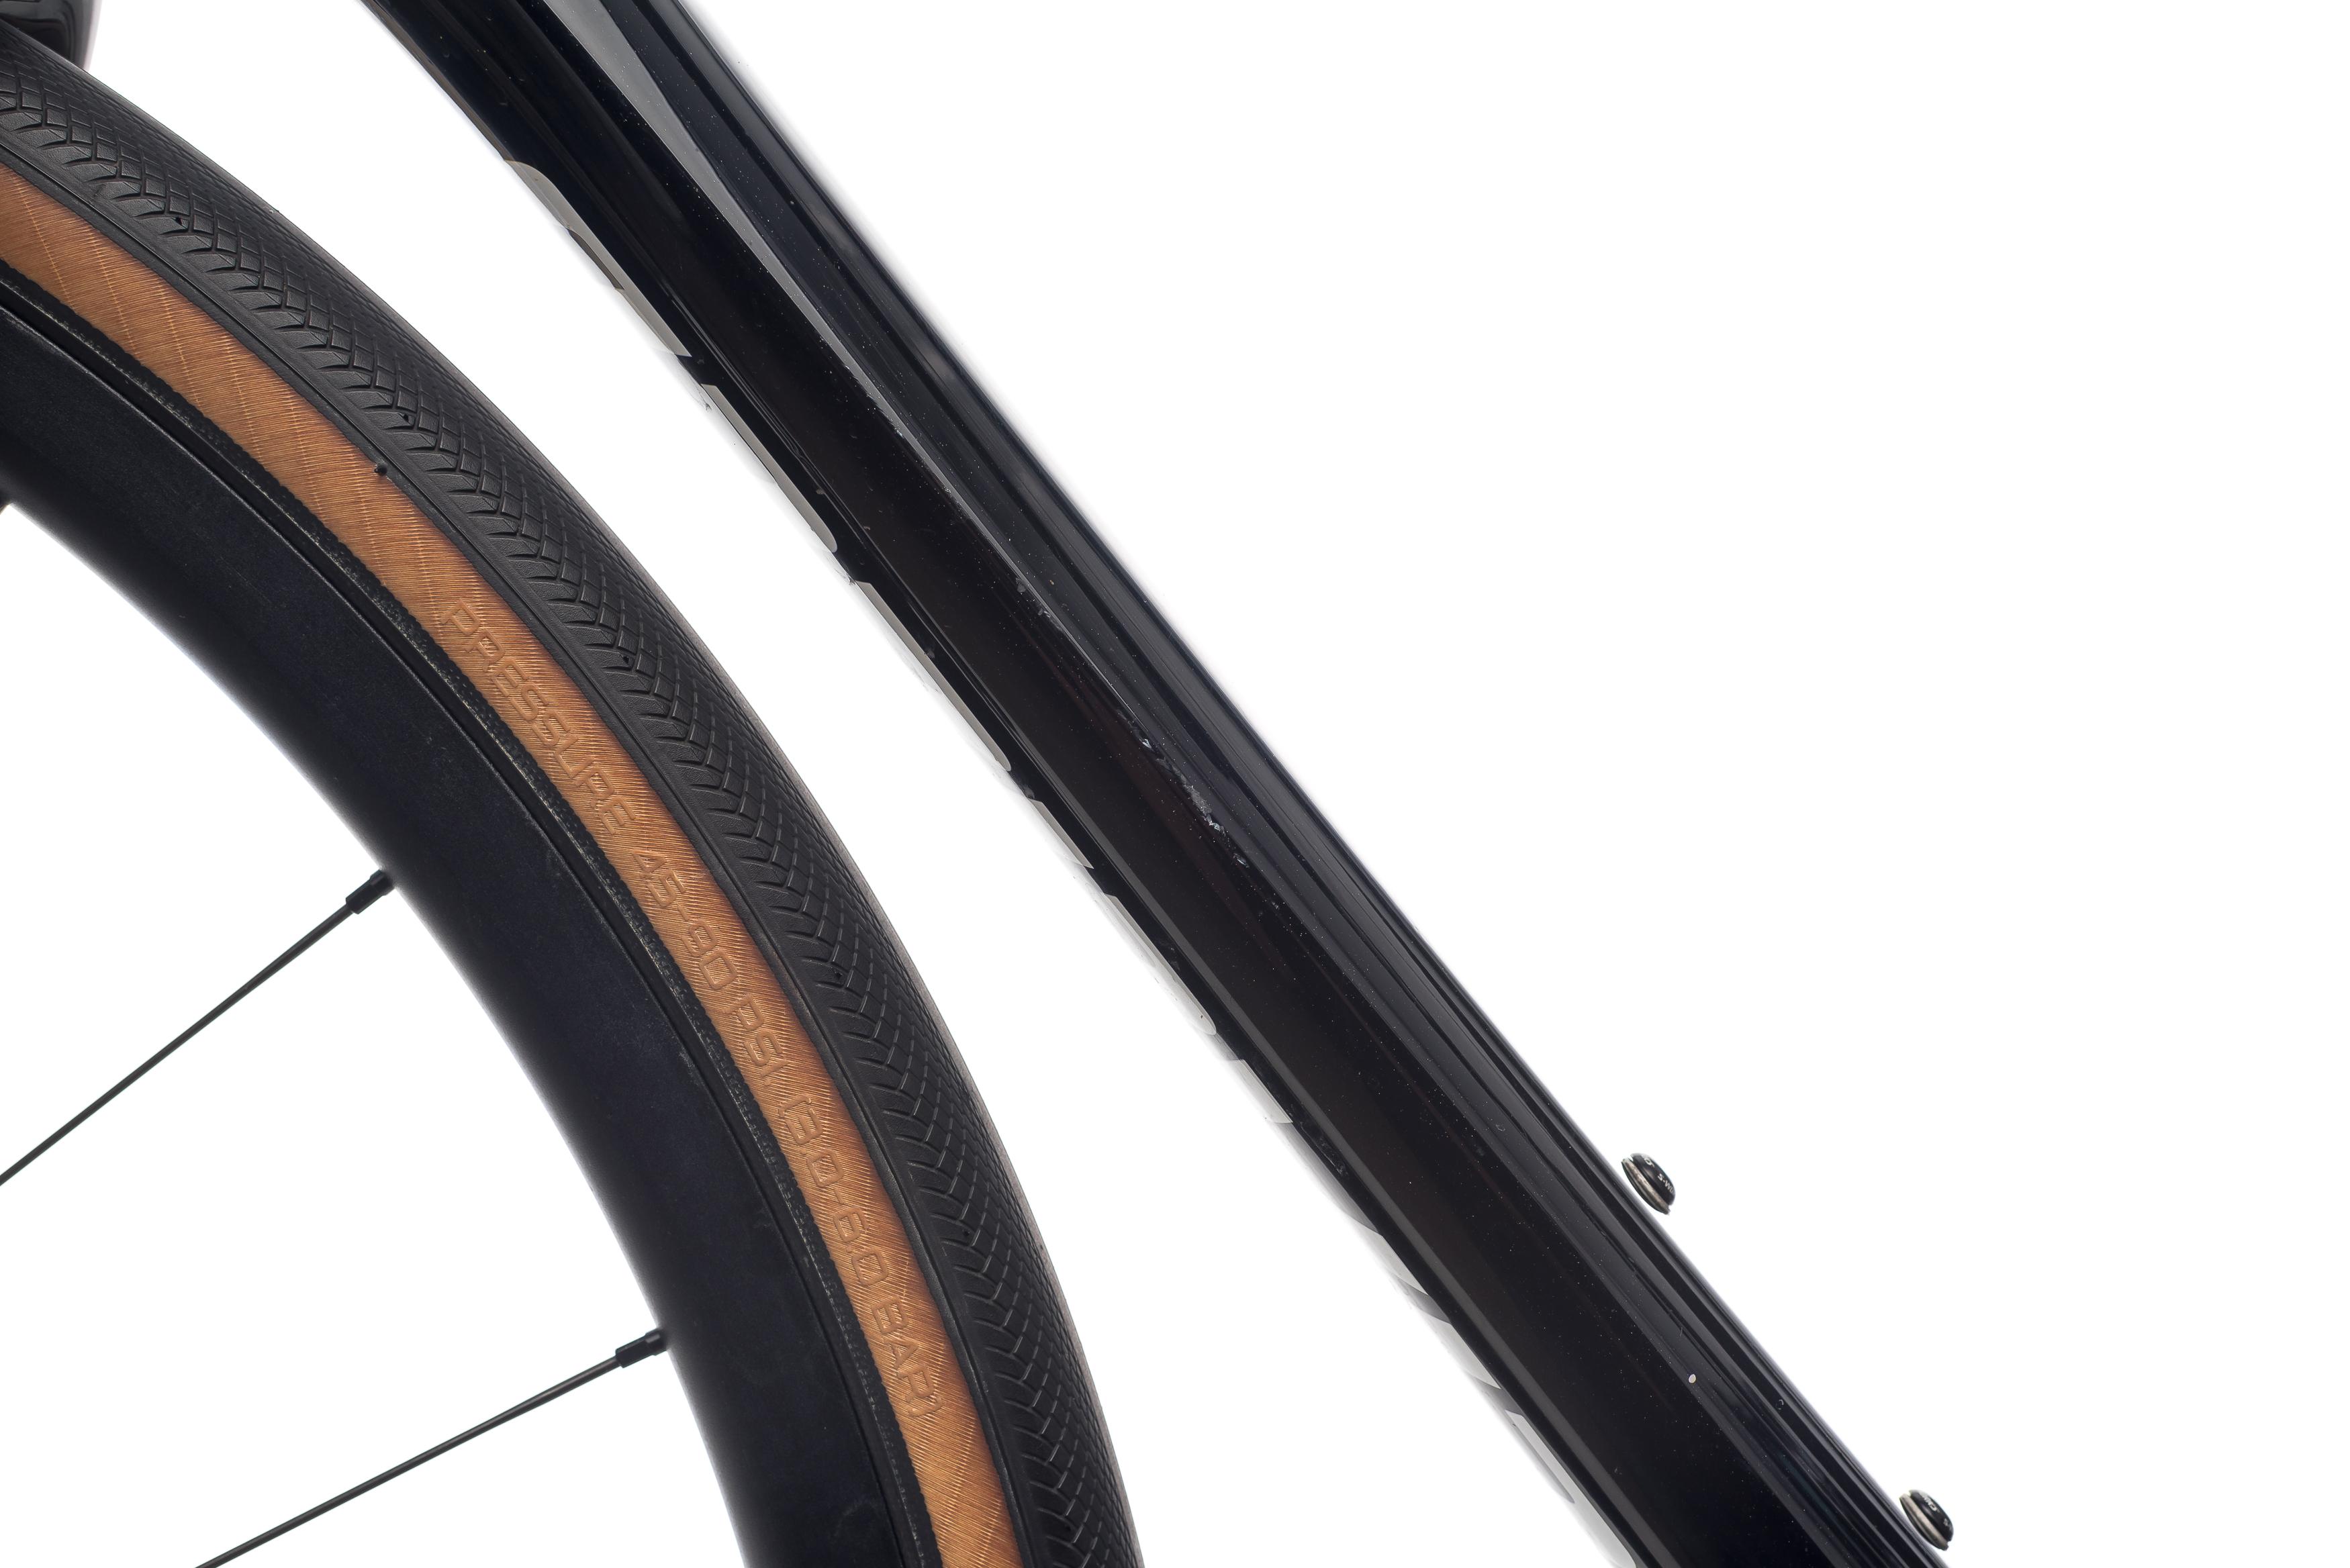 1172d7e3248 2017 Specialized Ruby Project Black Womens Road Bike 54cm Shimano Dura-Ace  Di2